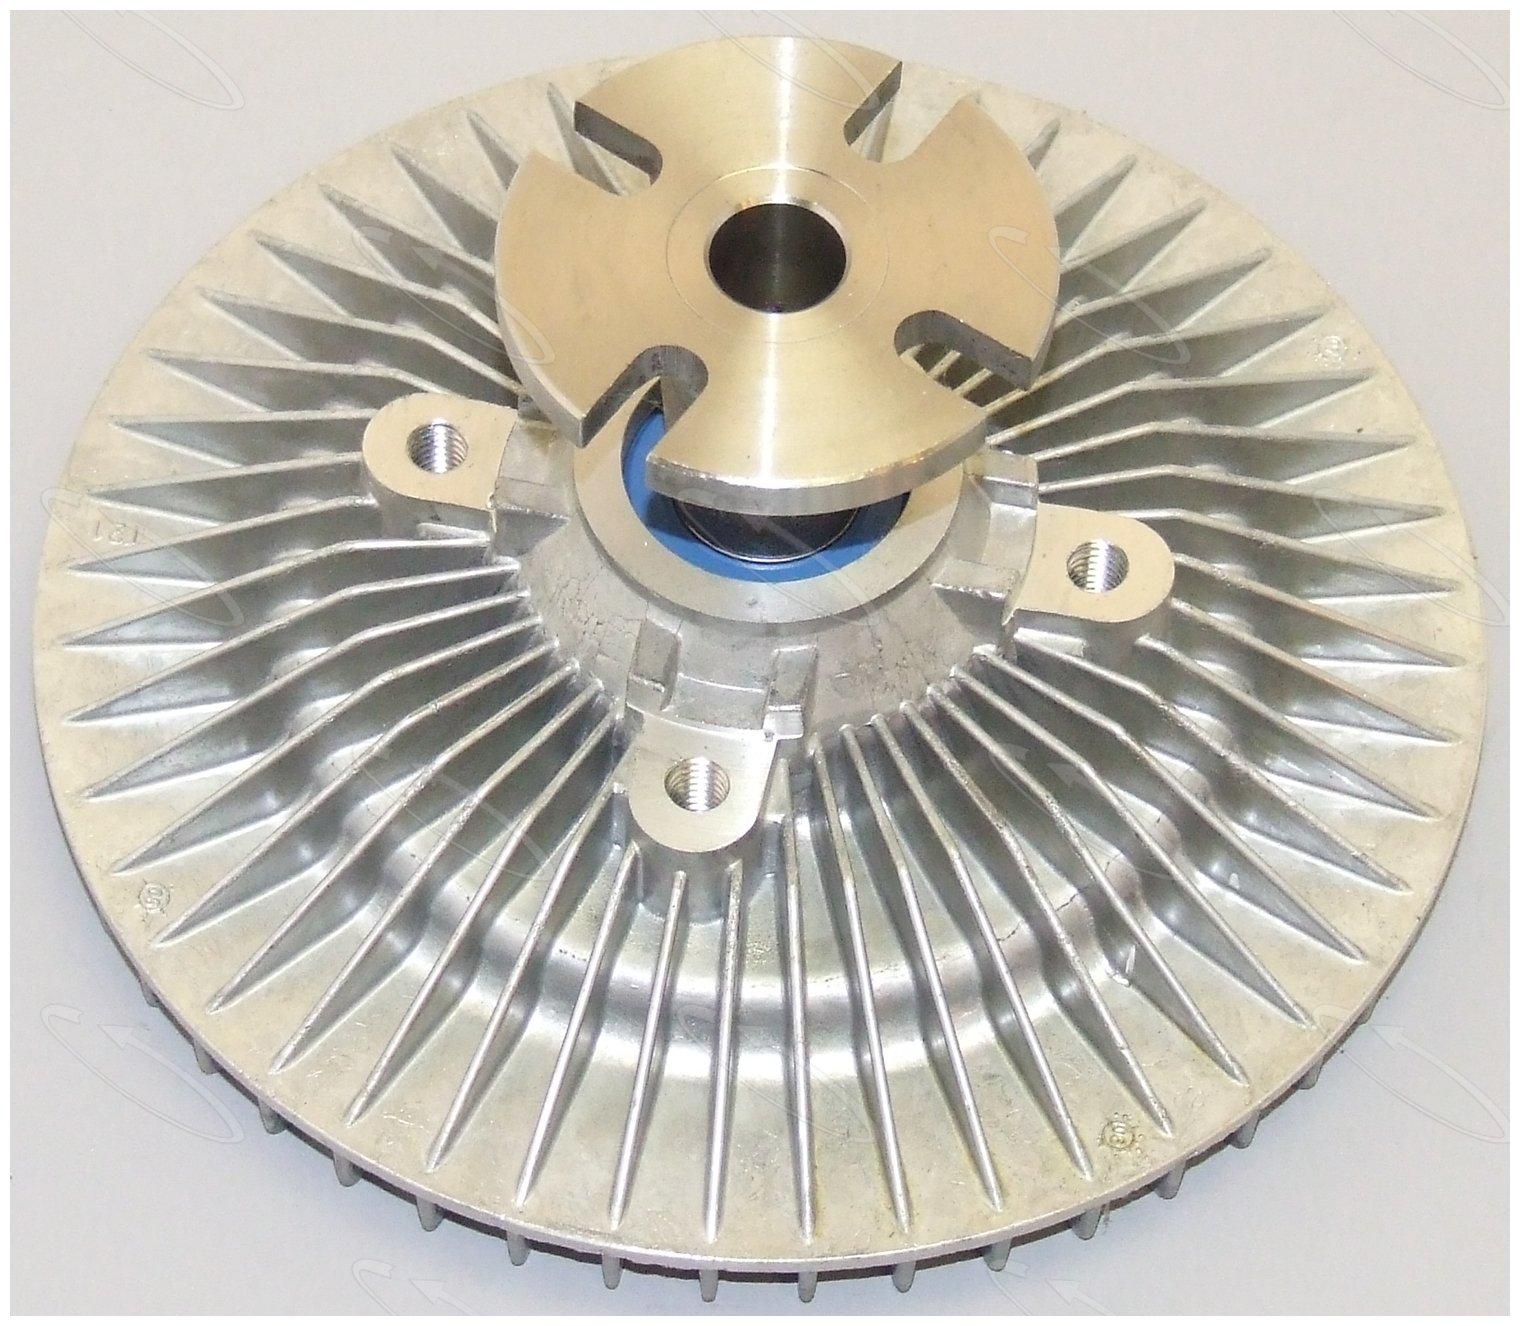 Hayden Automotive 2713 Premium Fan Clutch